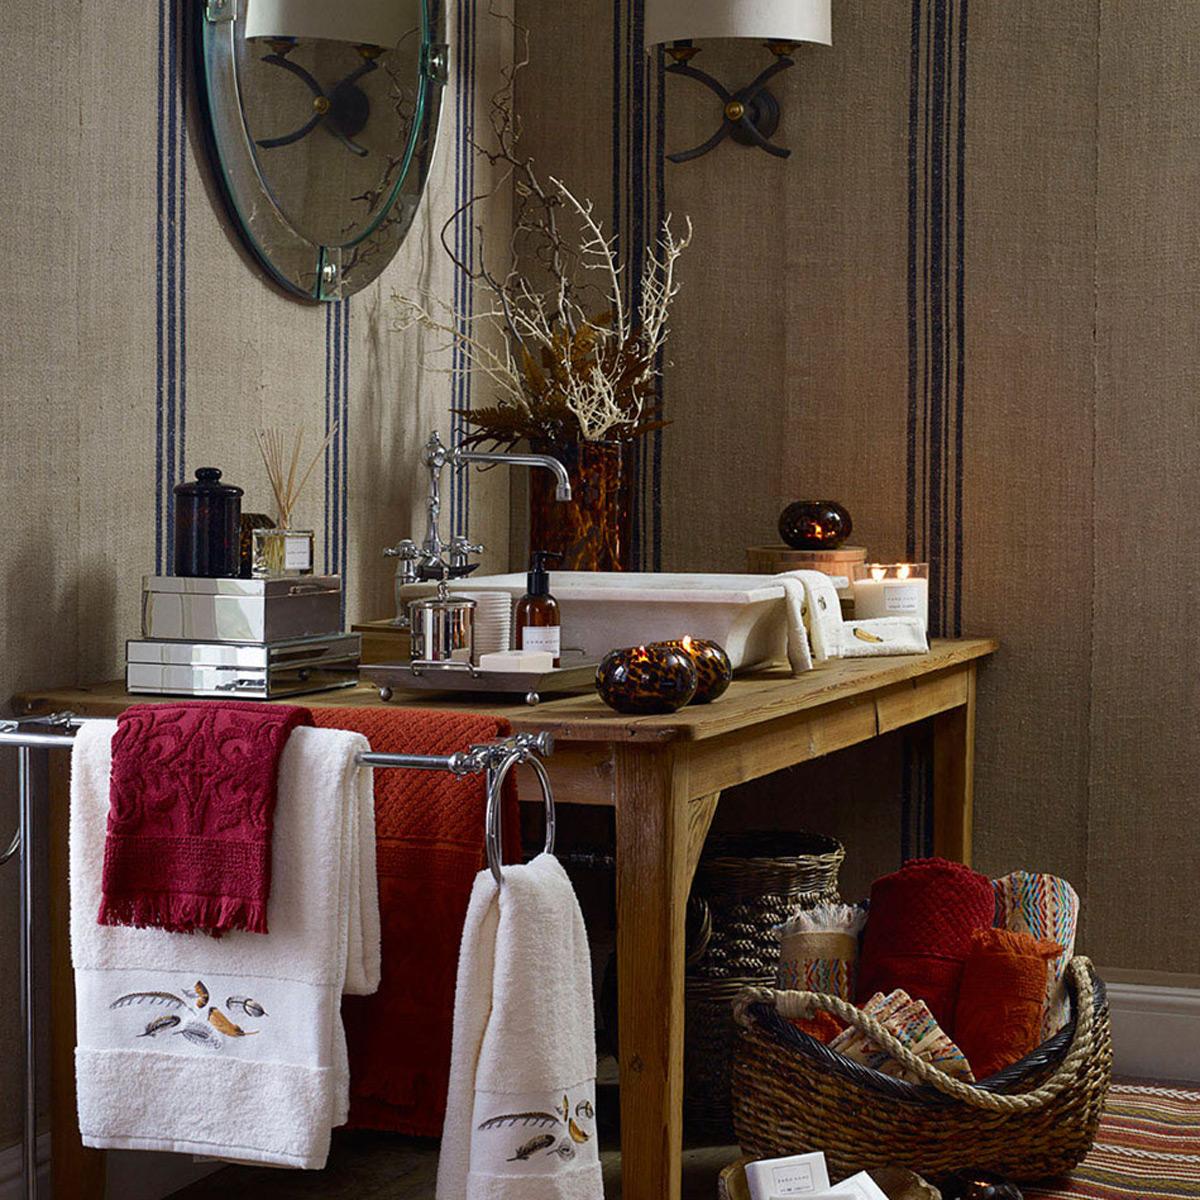 Stylish Ways To Update A Bathroom Decorating Ideas